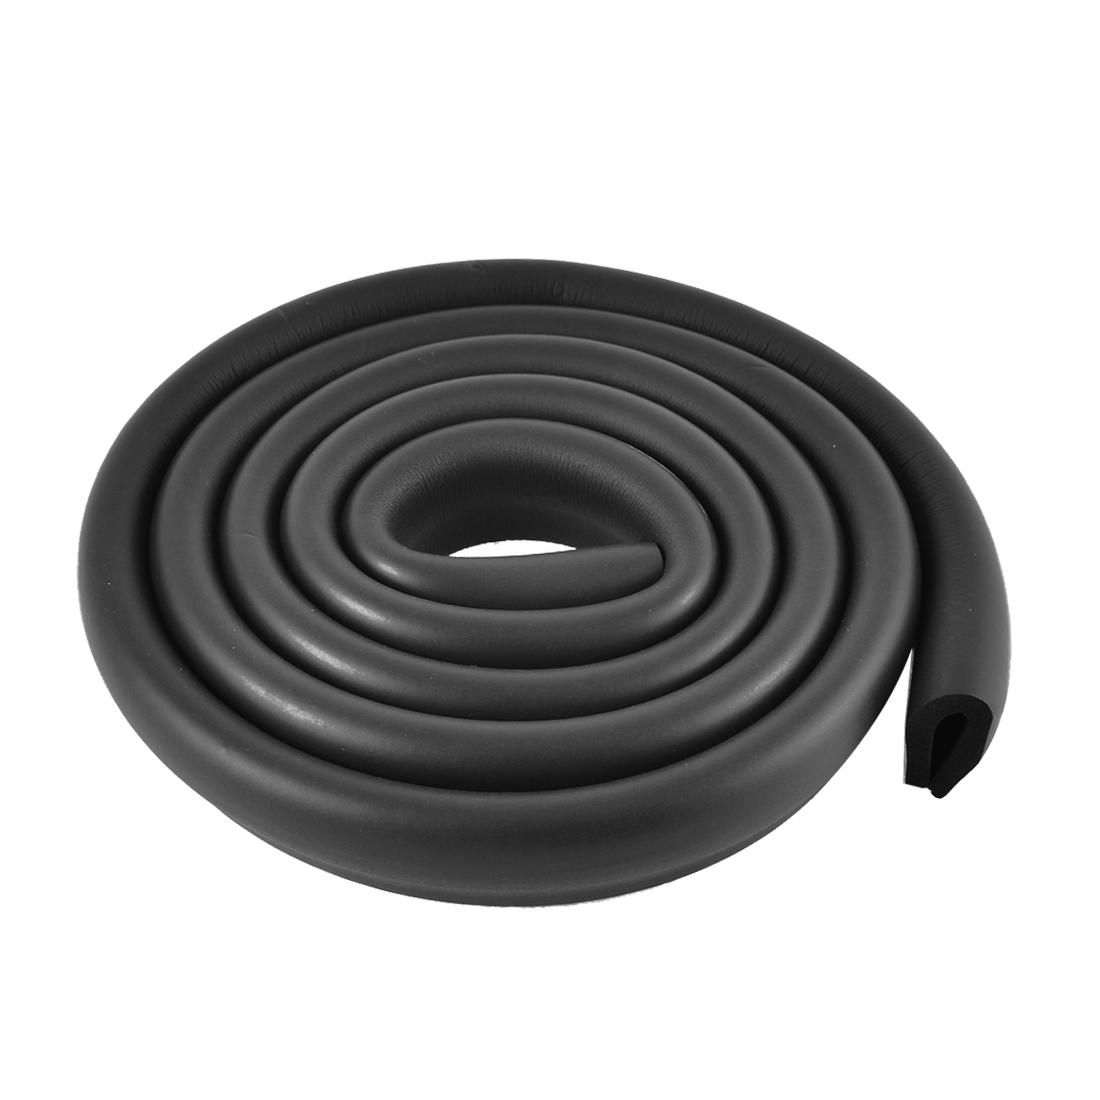 Table Corner Edge Softener Safety Protection Cushion Guard 2M Long Black